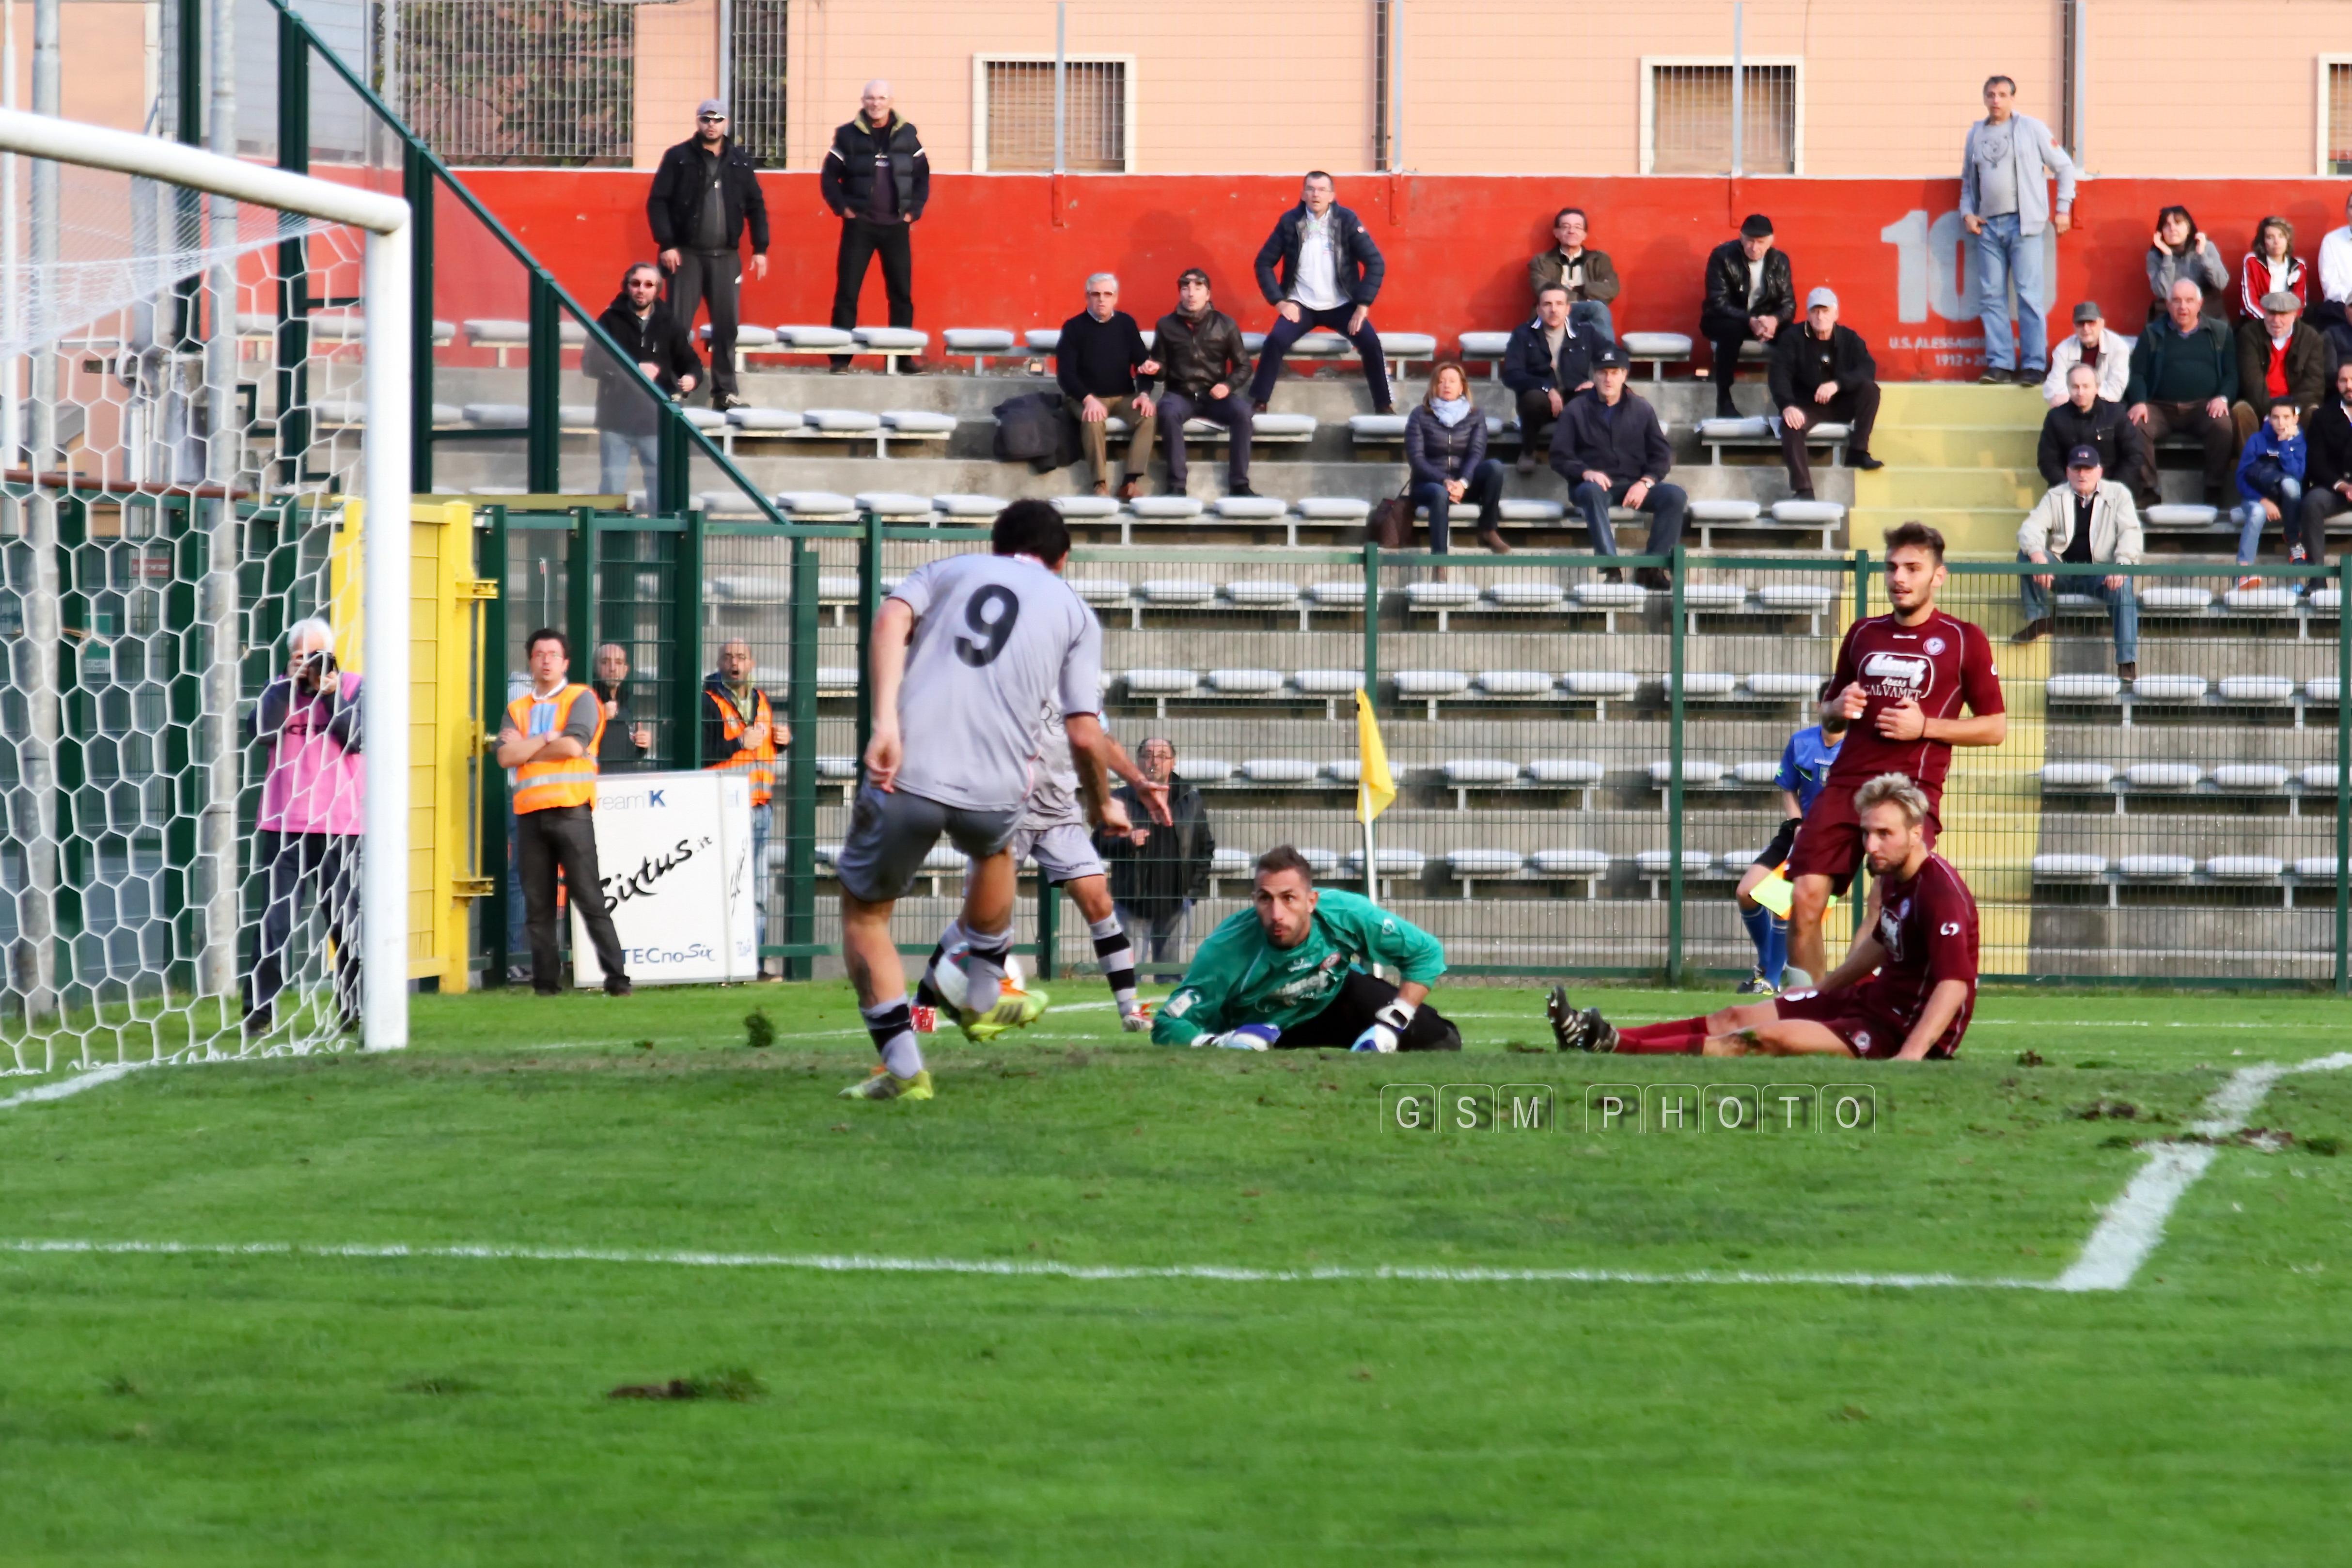 Alessandria-Arezzo_02_11_2014 (3)